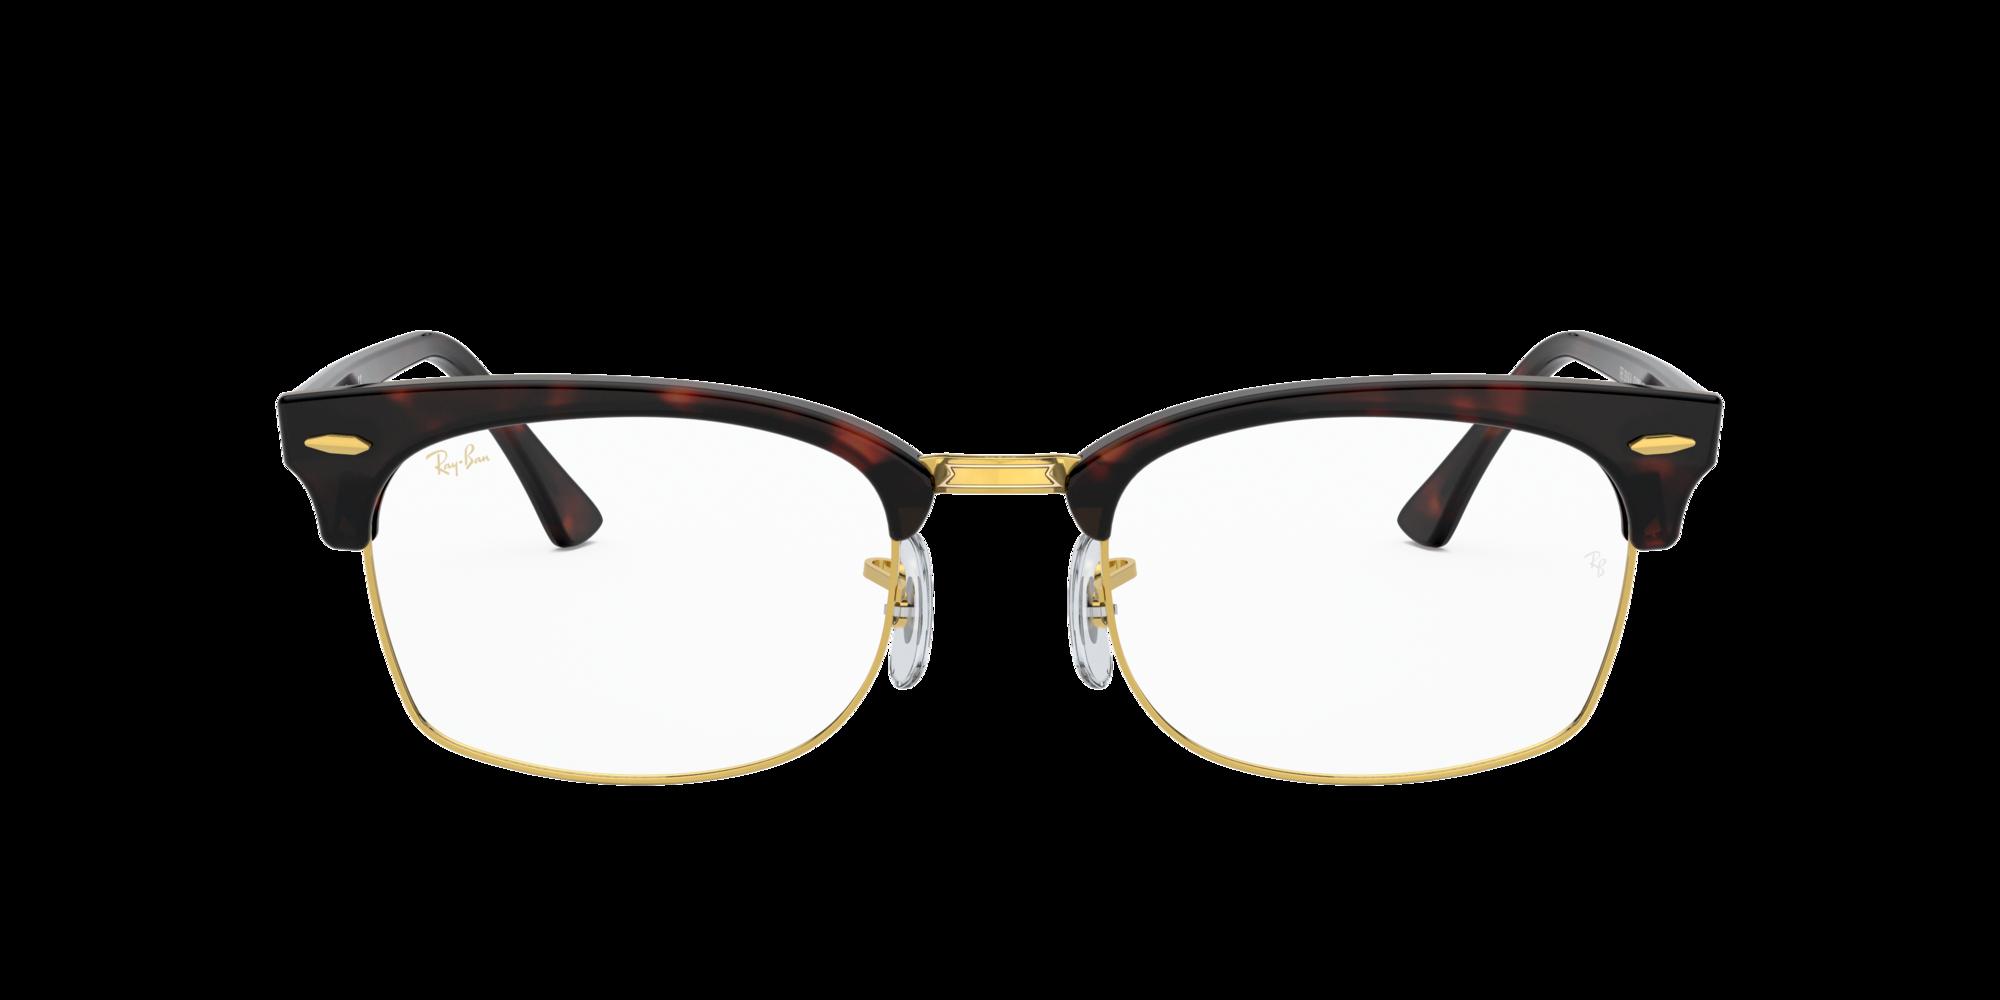 Image for RX3916V from LensCrafters | Glasses, Prescription Glasses Online, Eyewear